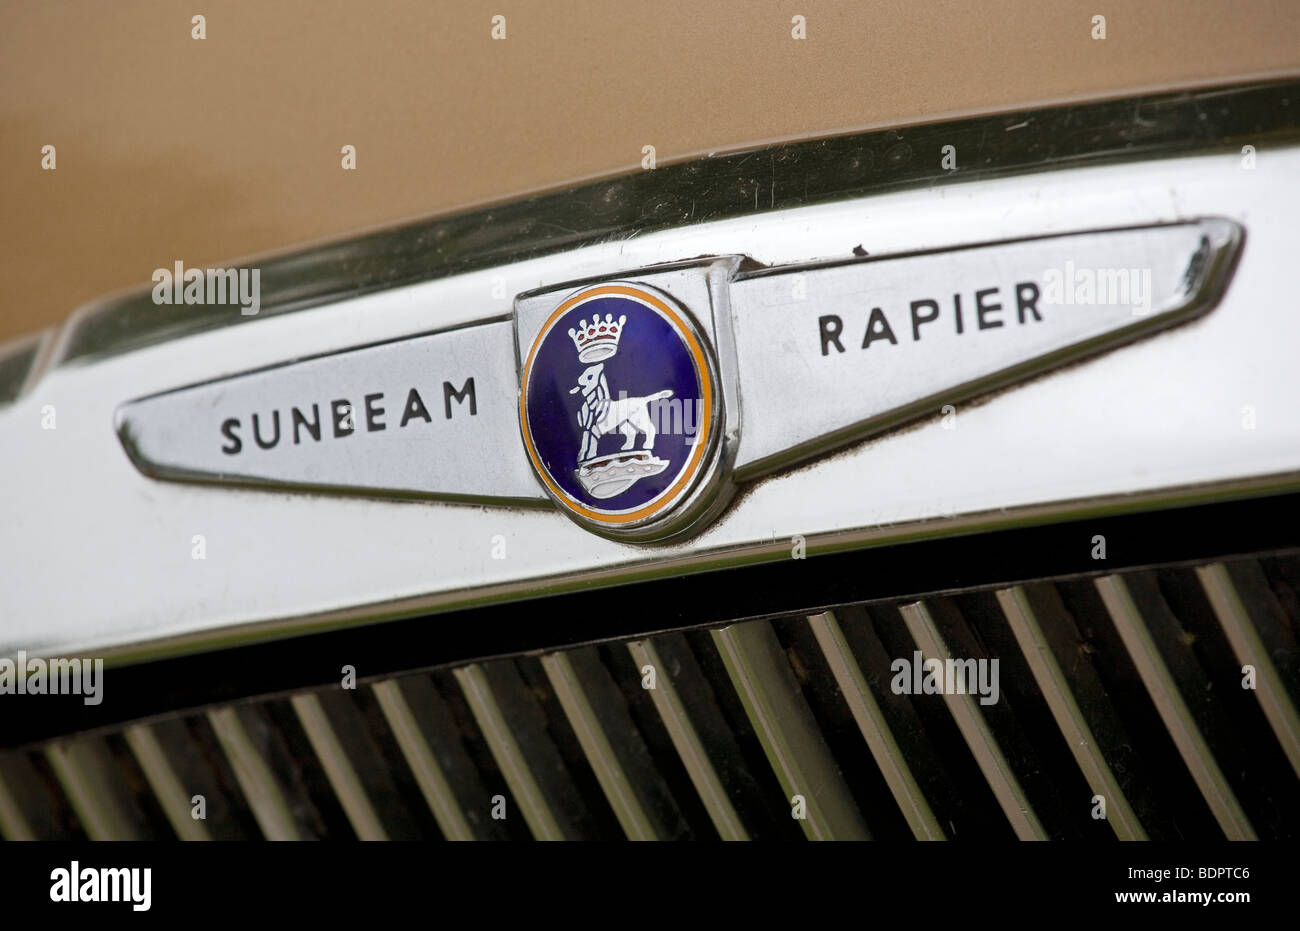 Sunbeam car badge - Stock Image